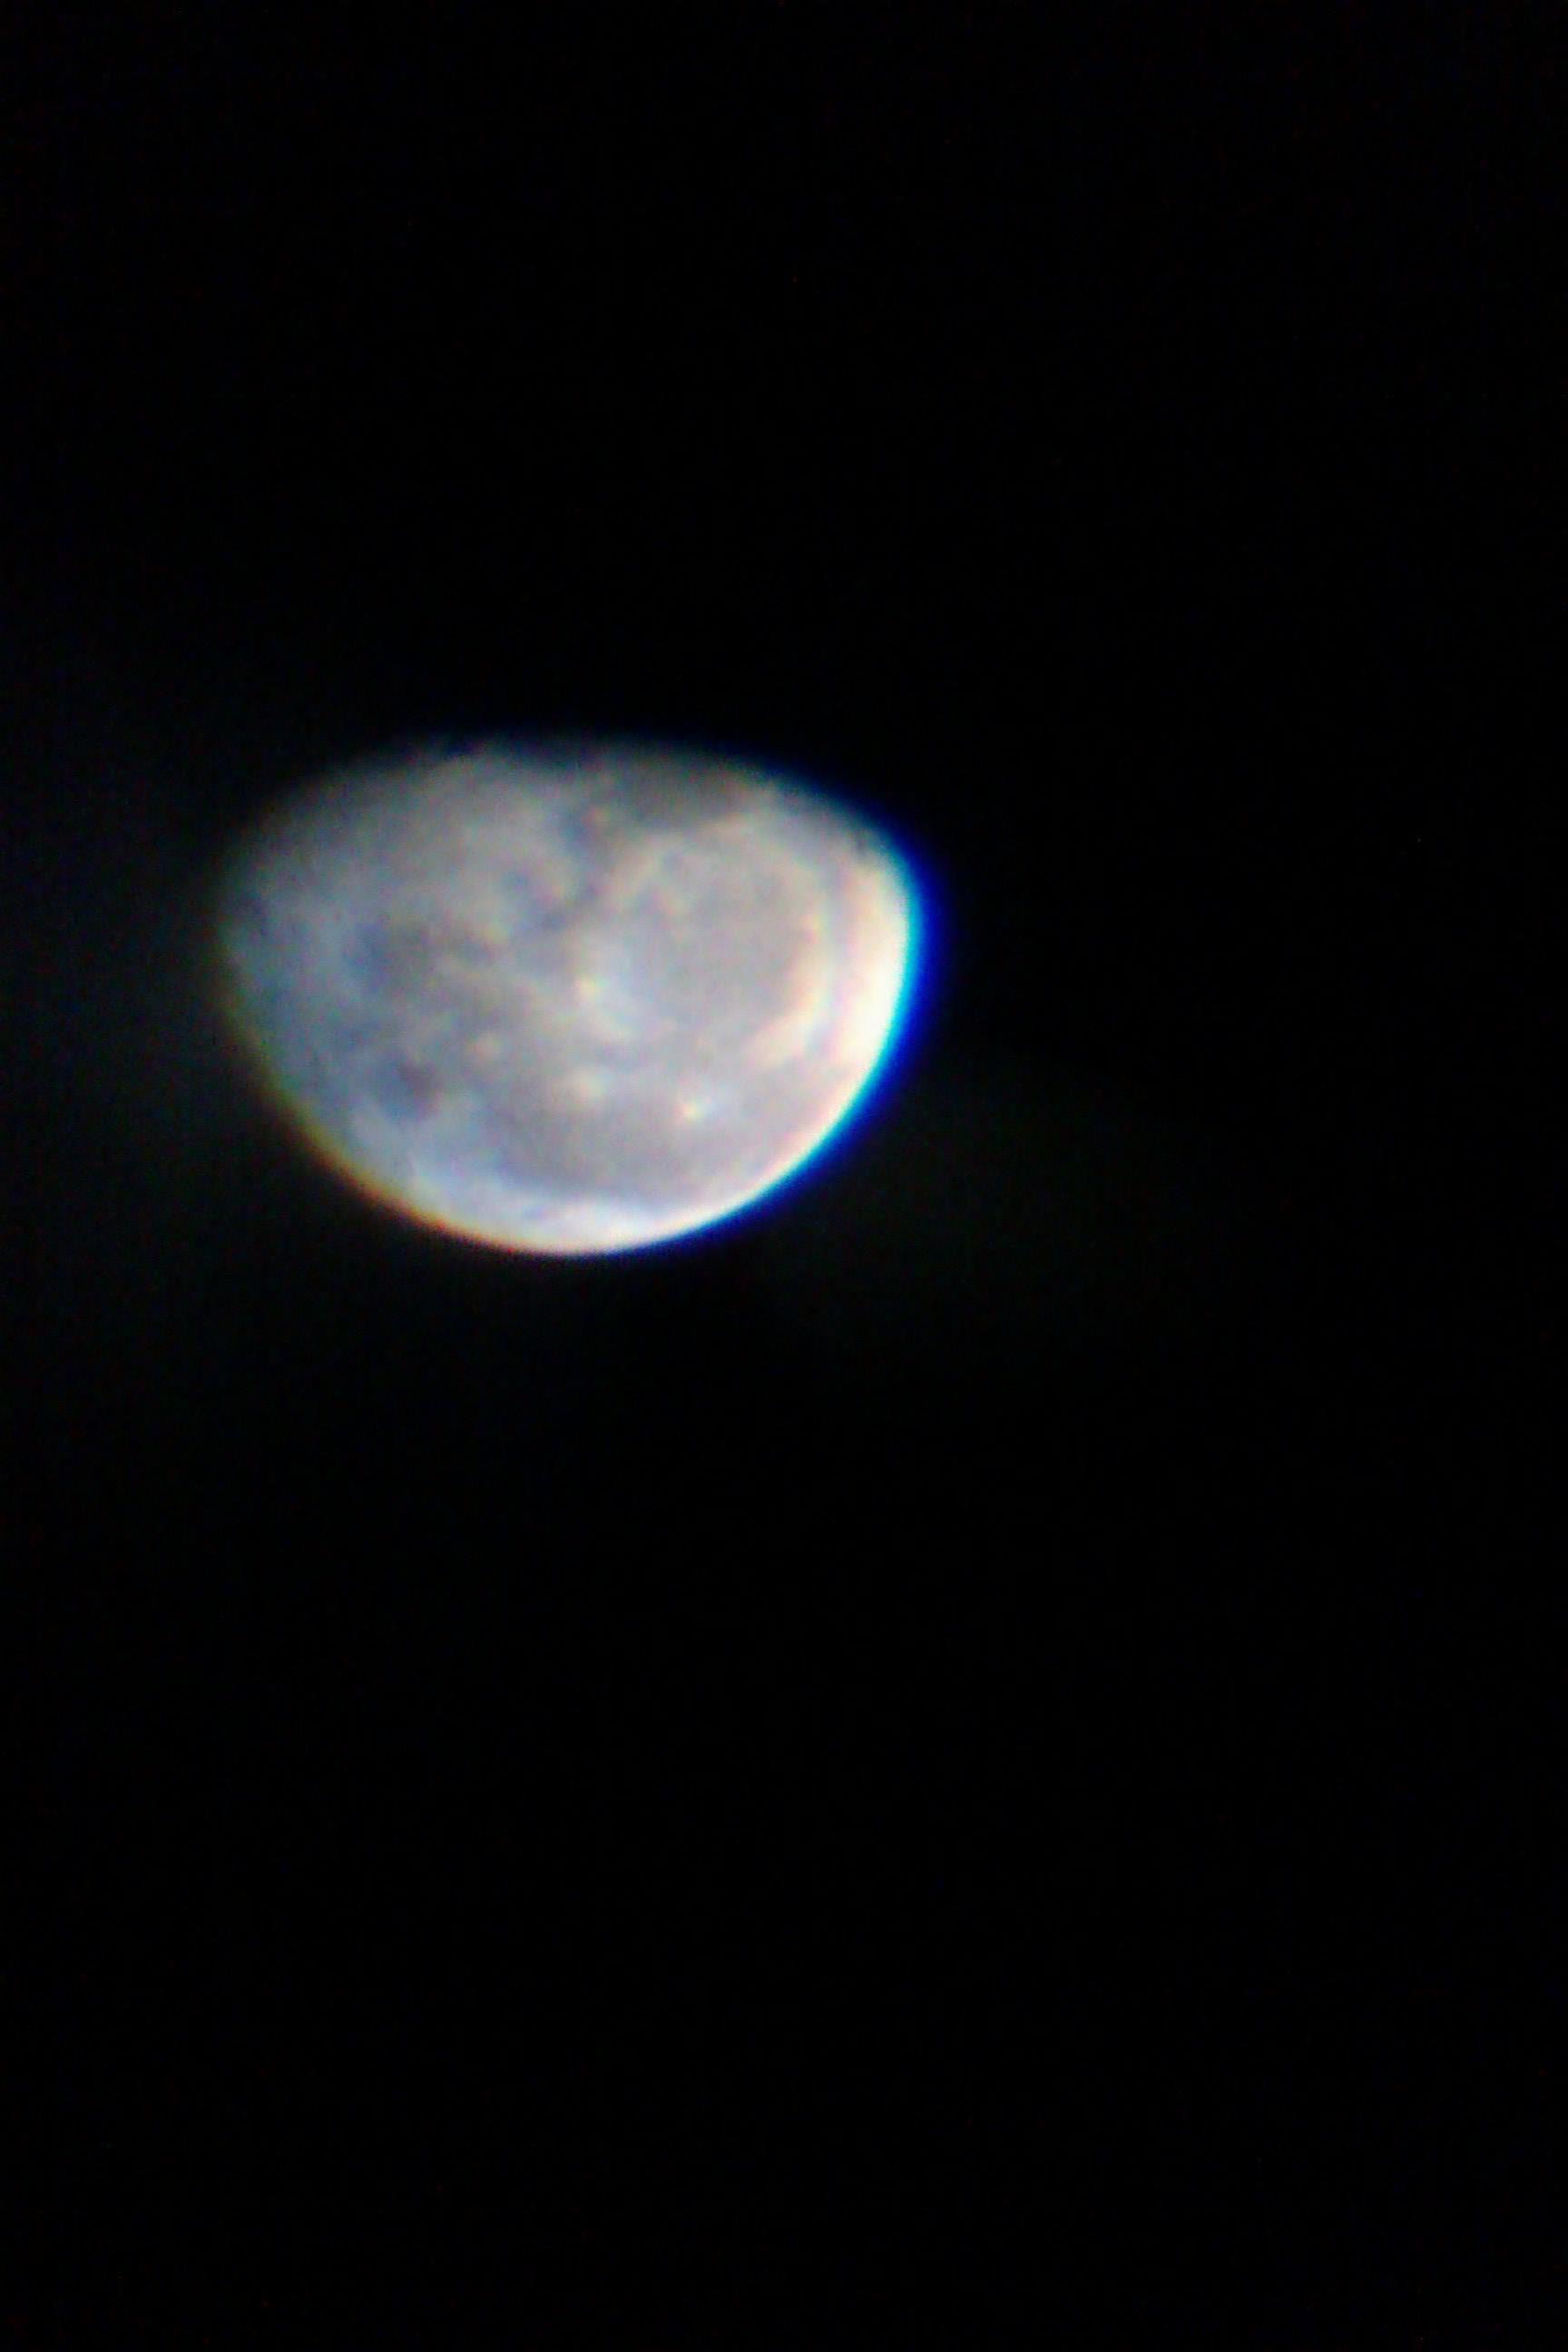 myblog.9e.cz/teleskop/M10.jpg